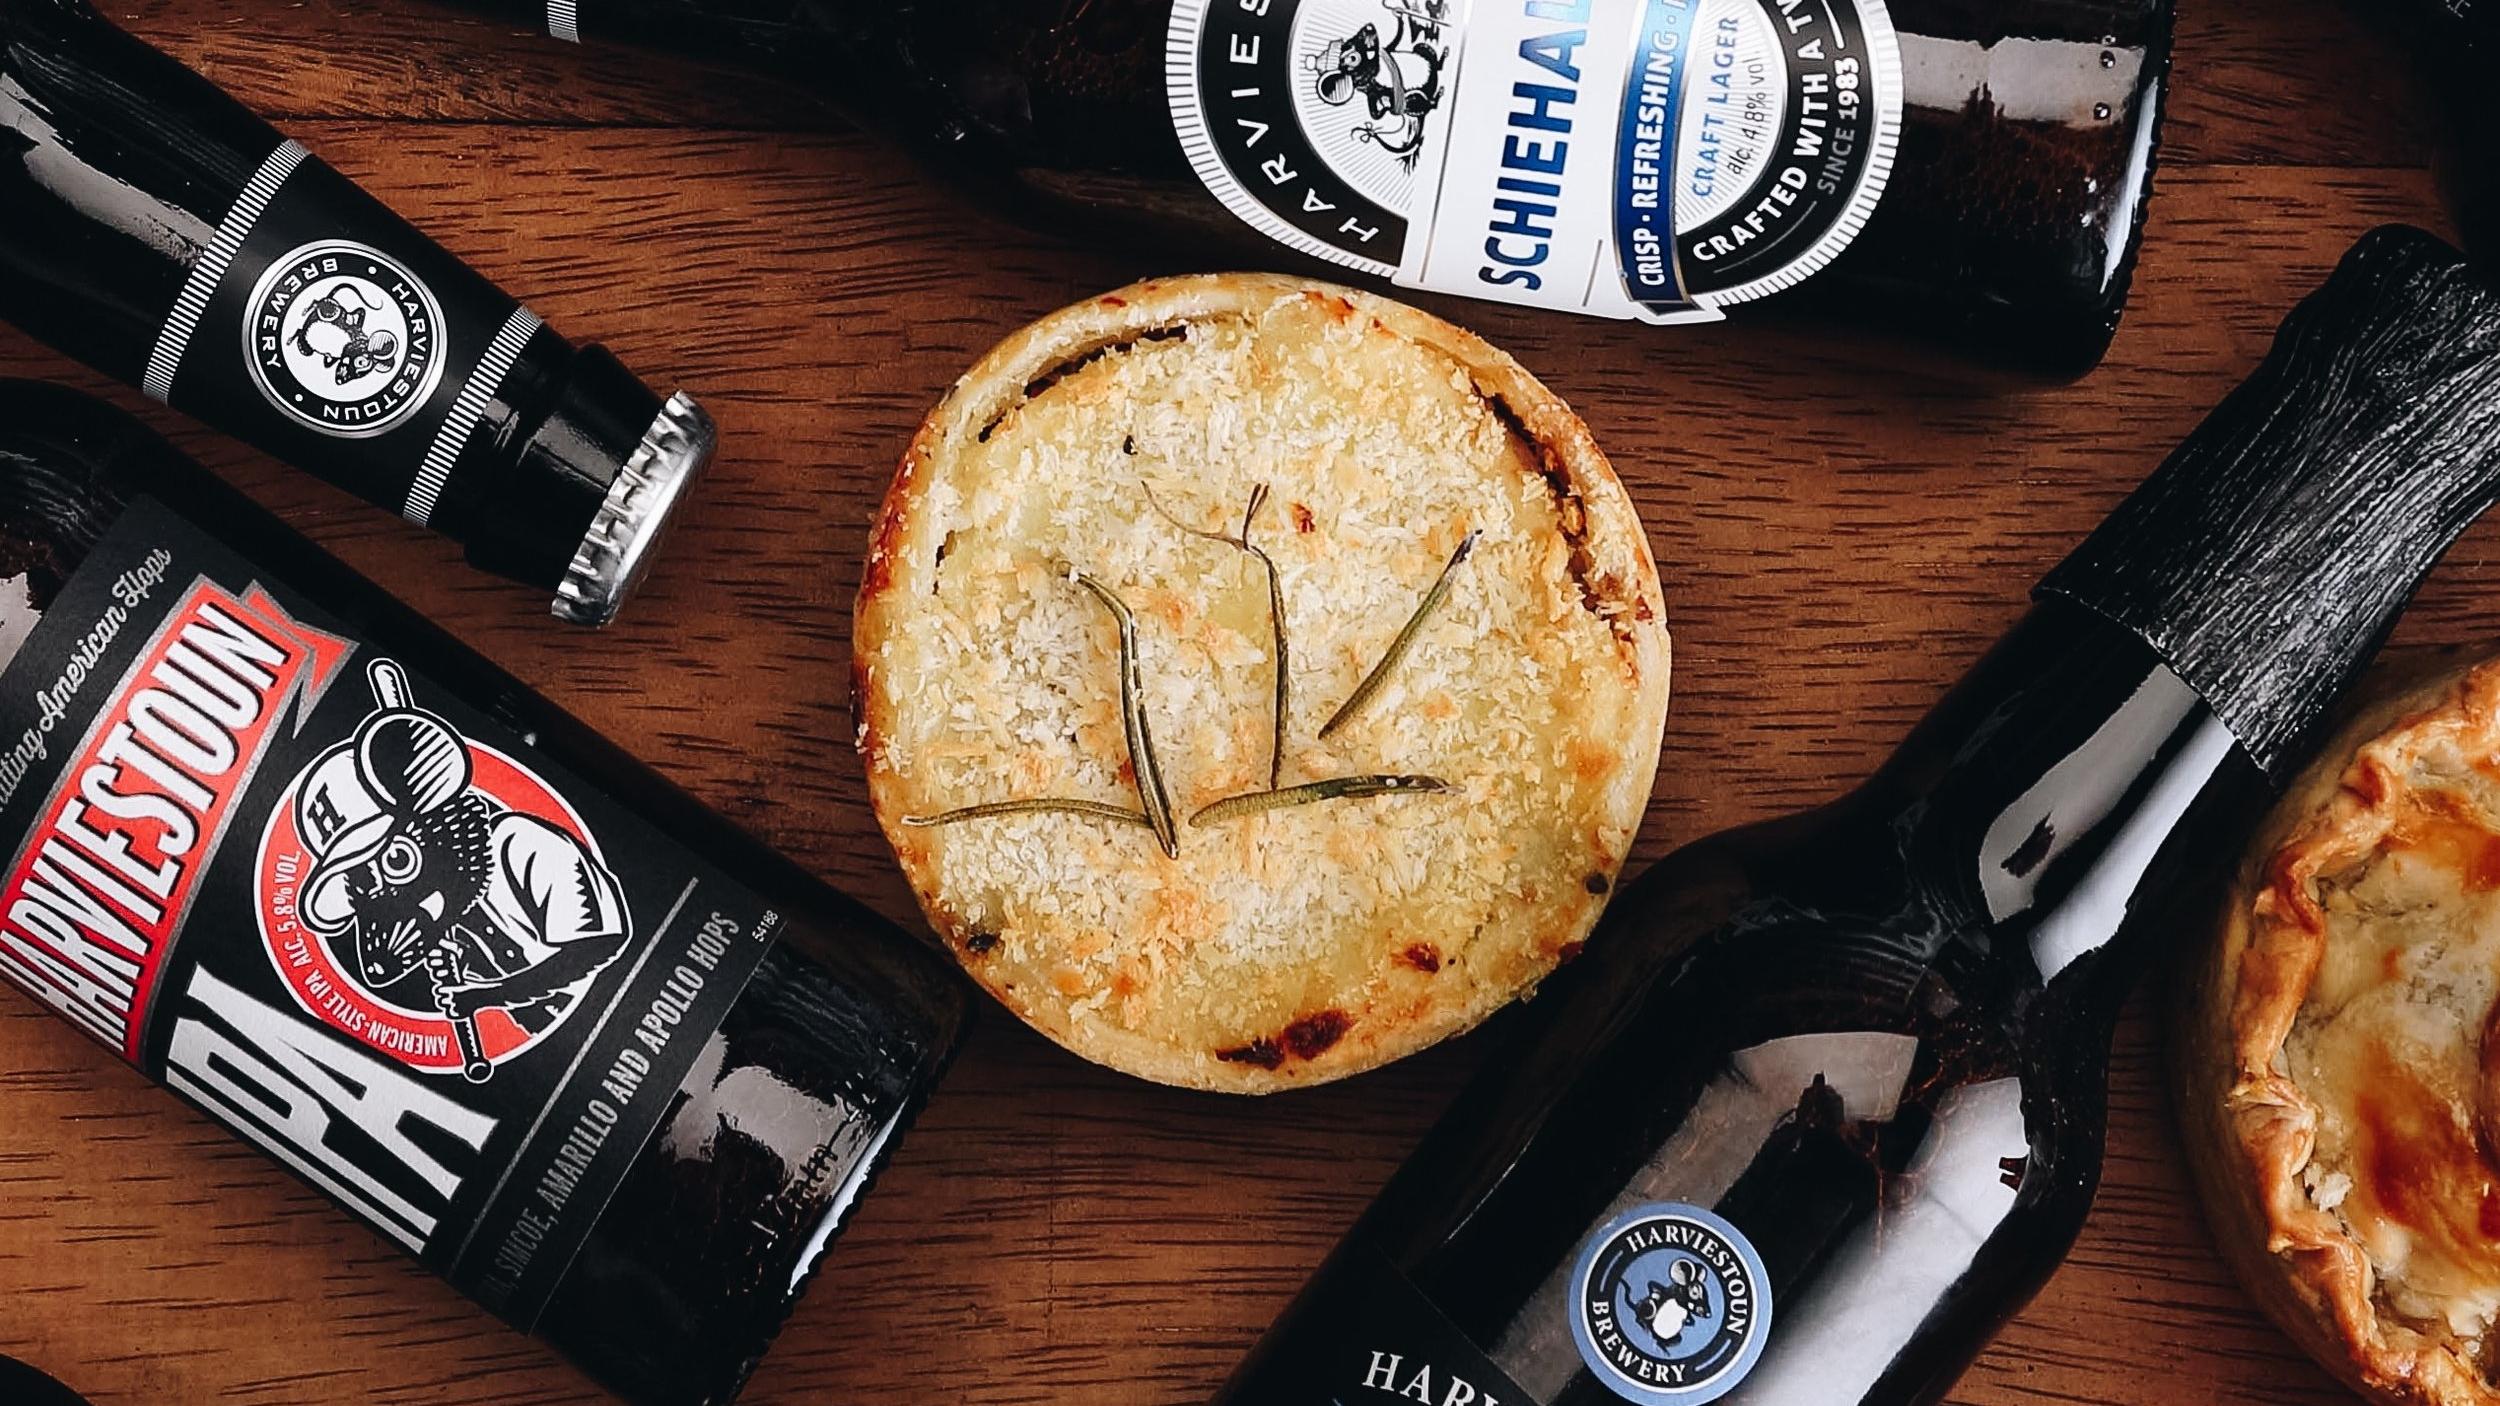 Harviestoun Pie & Beer Tasting Session.jpg